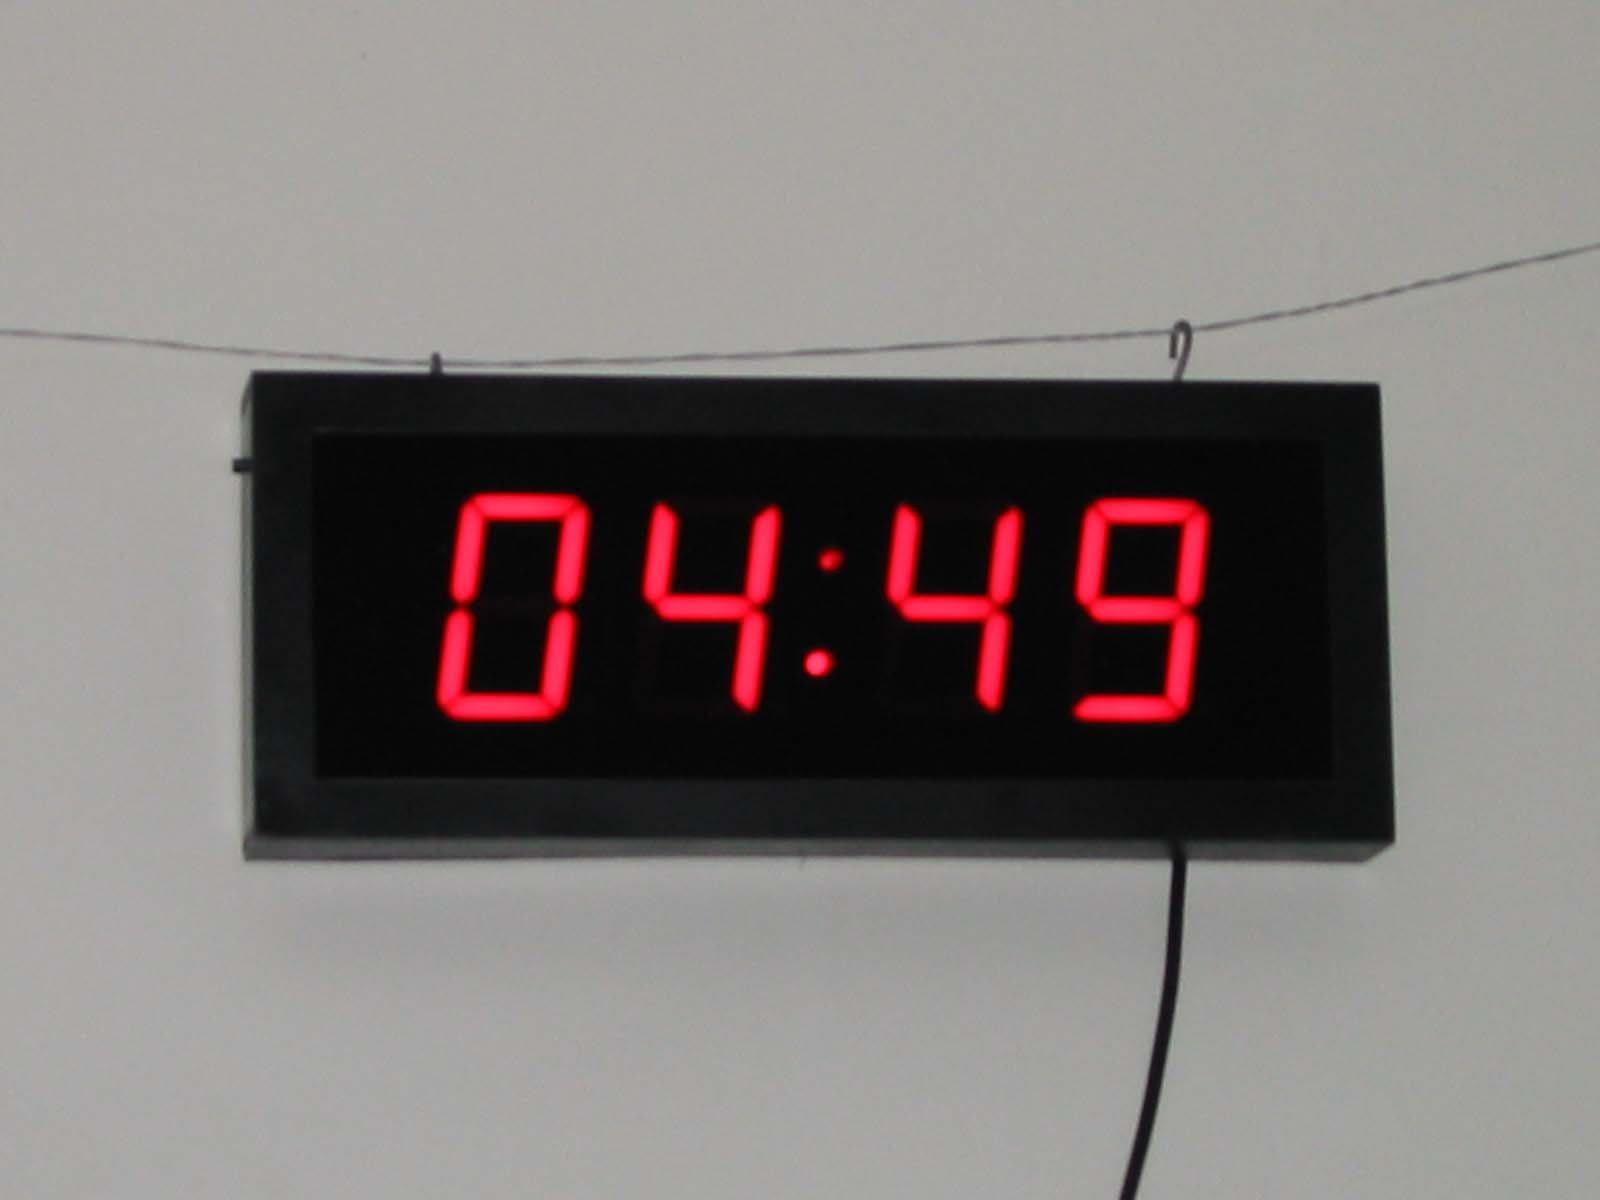 Led reloj digital relojes de escritorio y mesa for Reloj digital de mesa